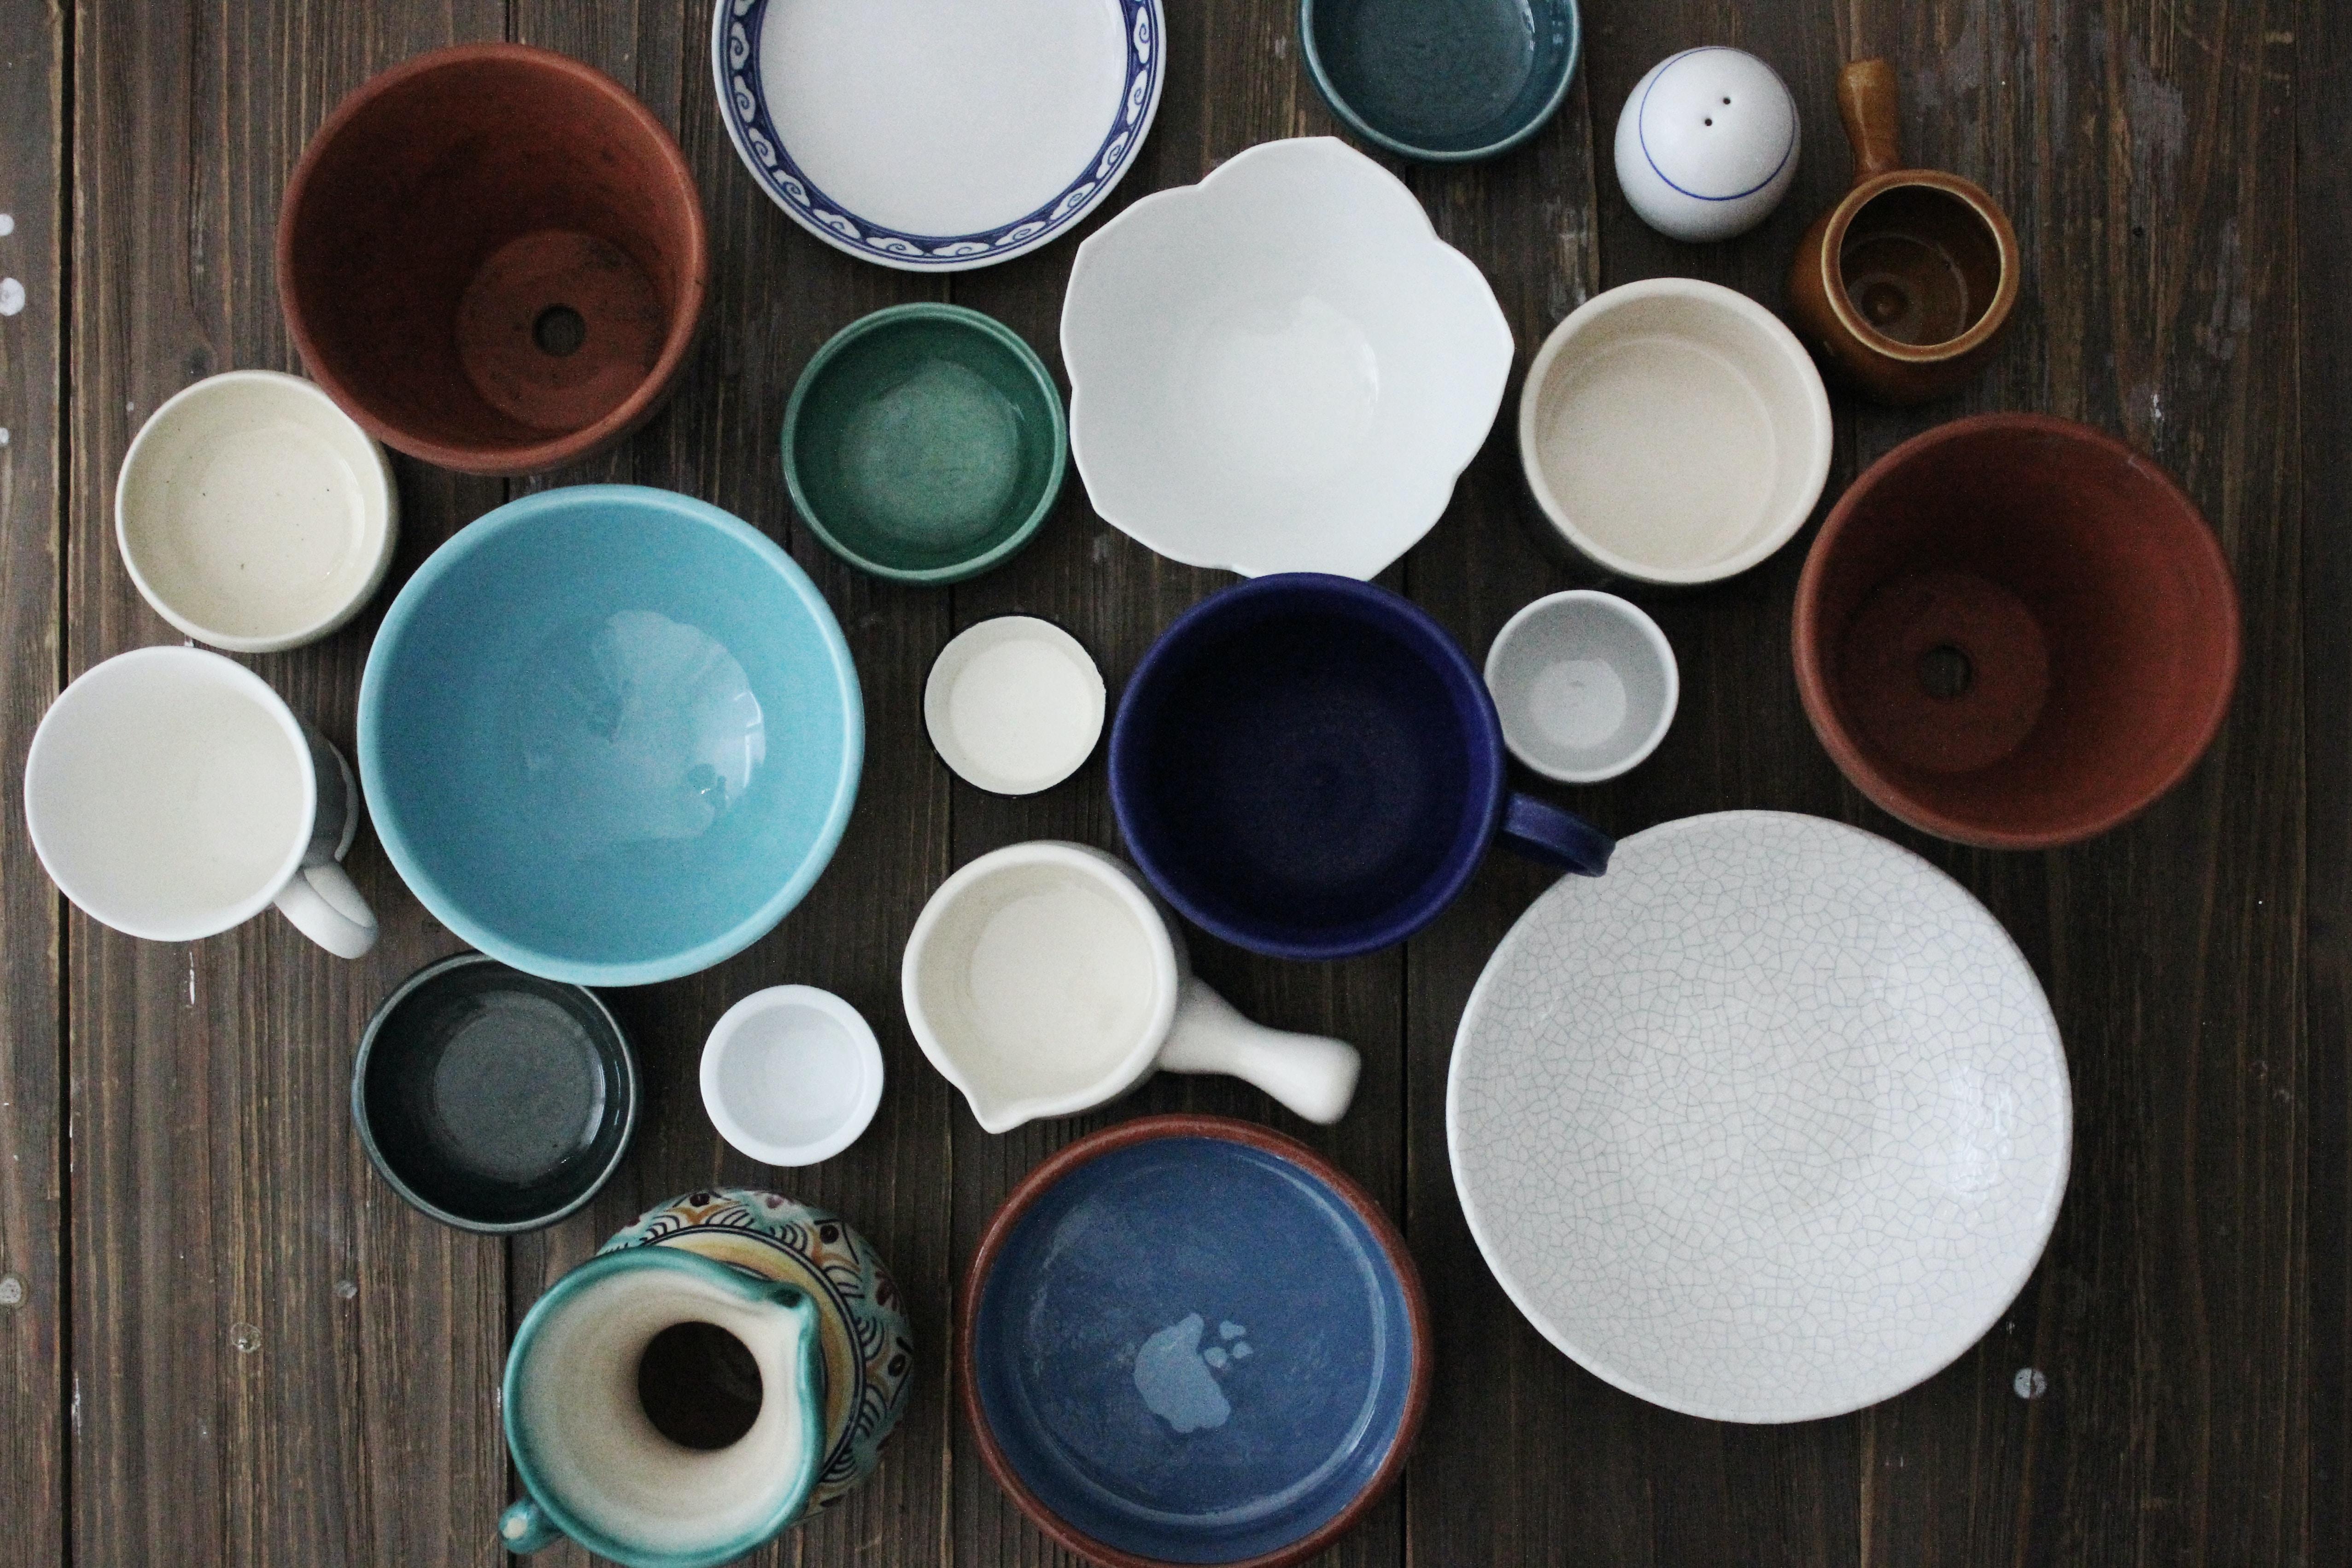 flatlay photo of ceramic mugs and bowls